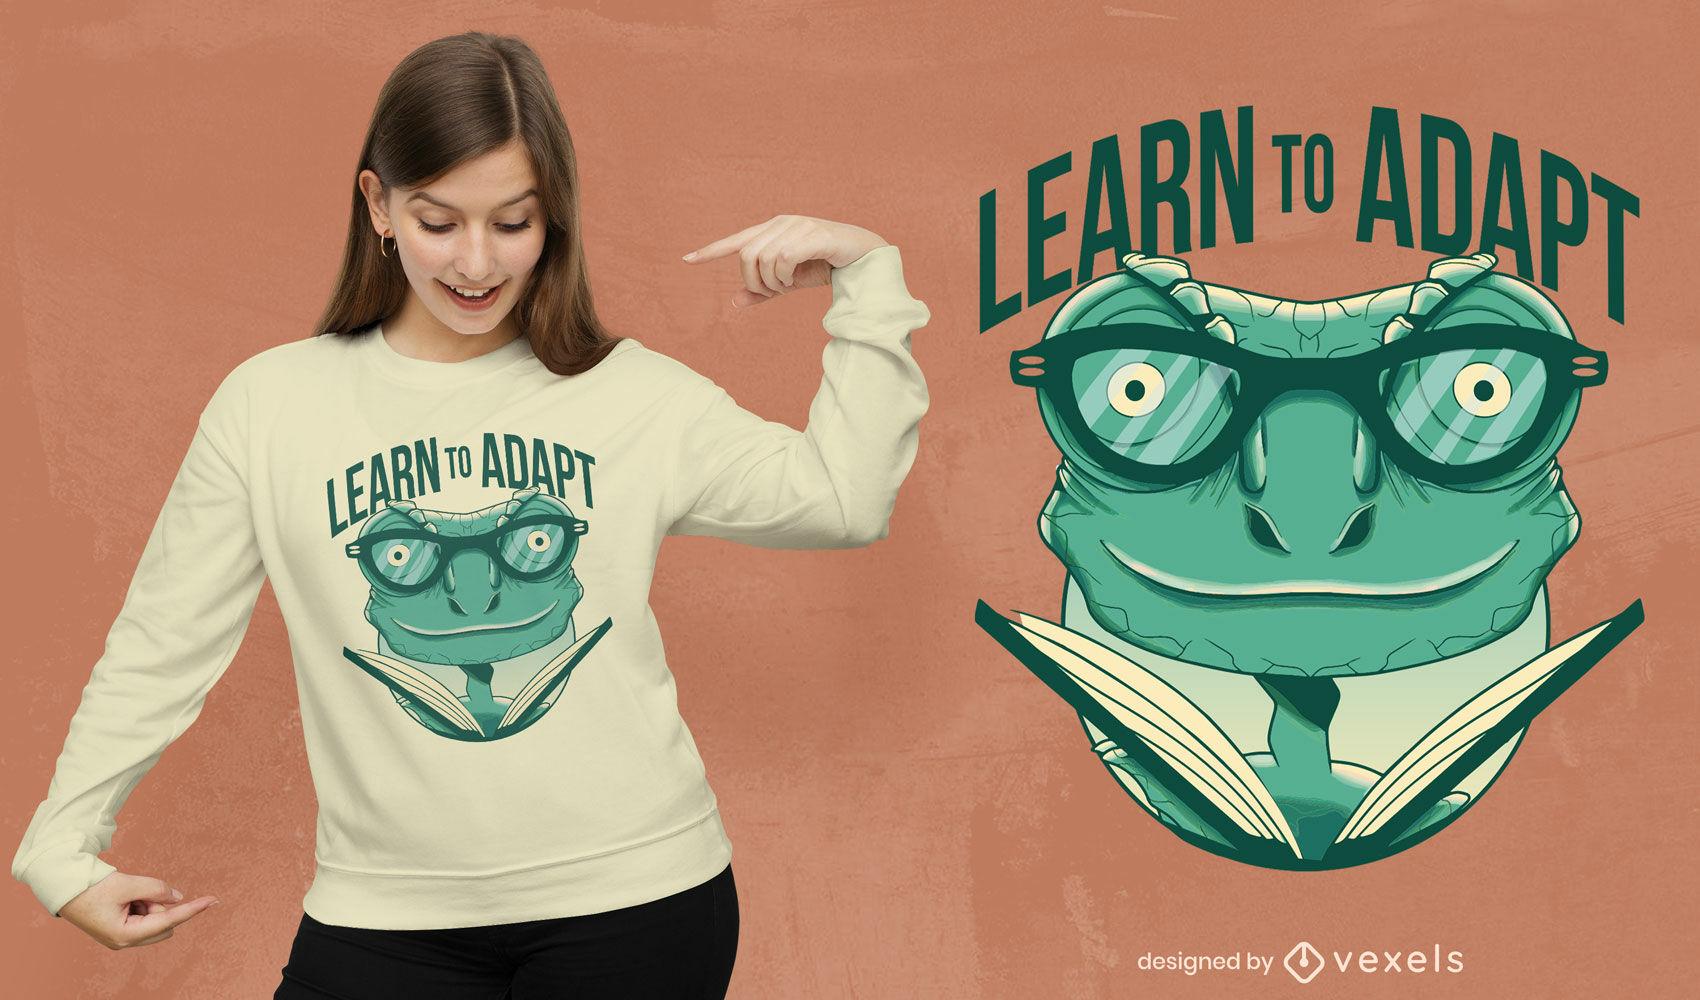 Learn to adapt reading chameleon t-shirt design